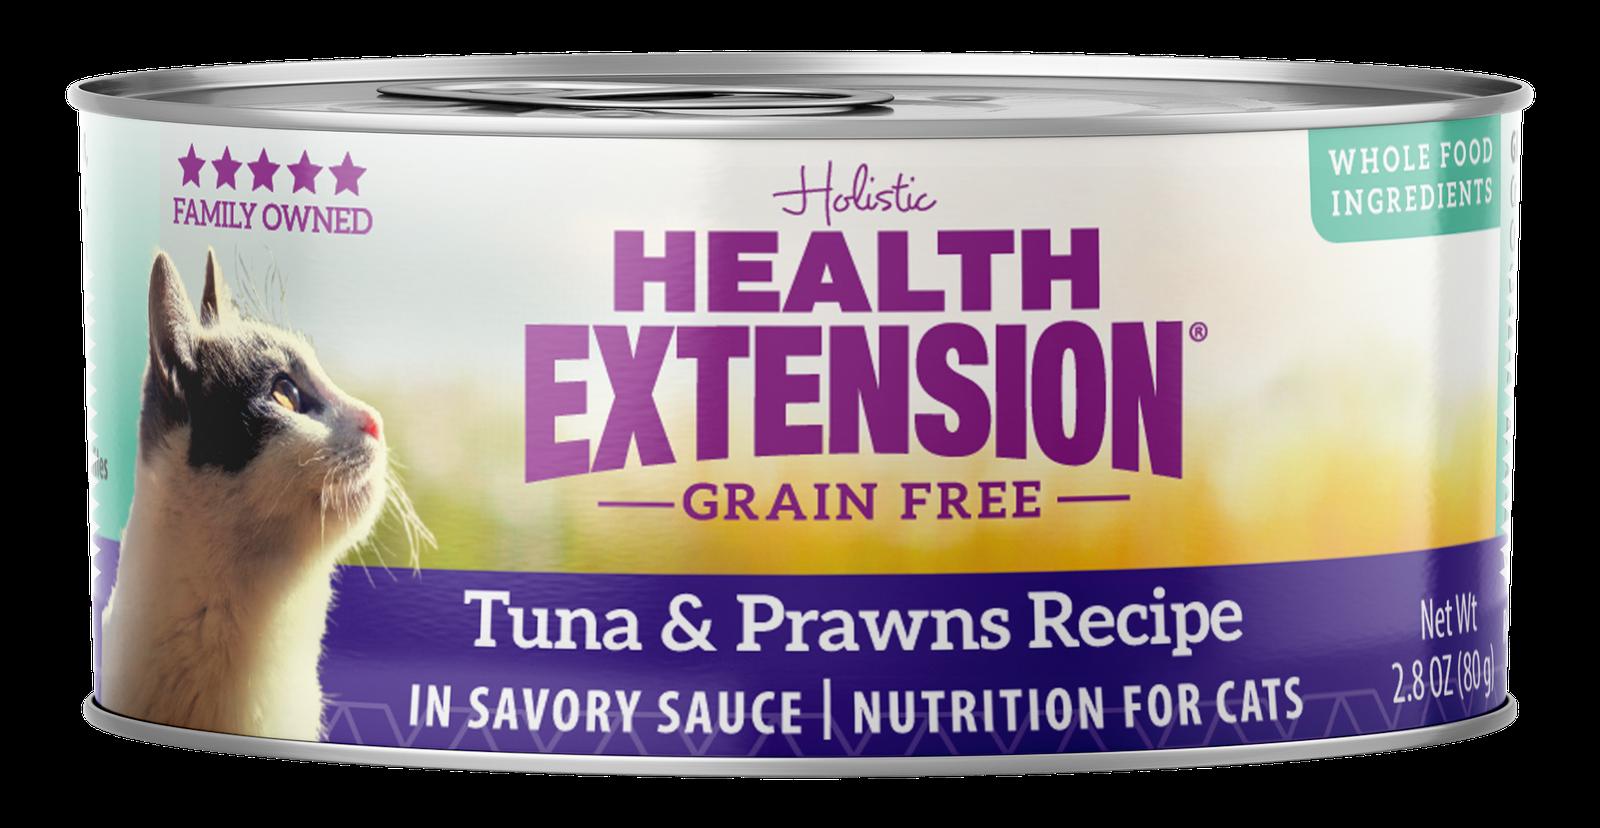 Health Extension Grain-Free Tuna & Prawns Recipe Canned Cat Food Image